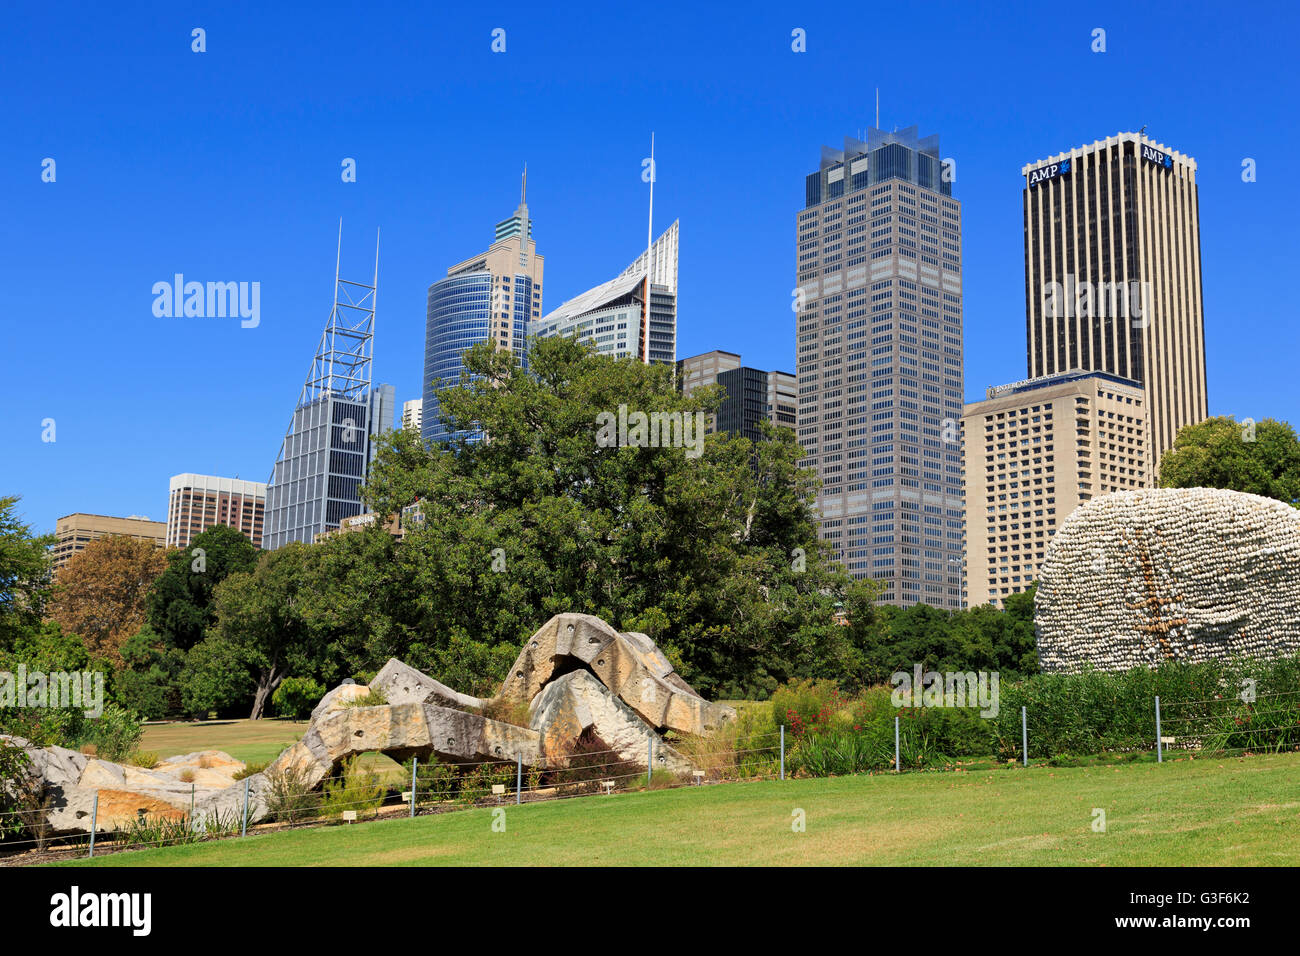 Royal Botanic Garden, Sydney, New South Wales, Australia - Stock Image